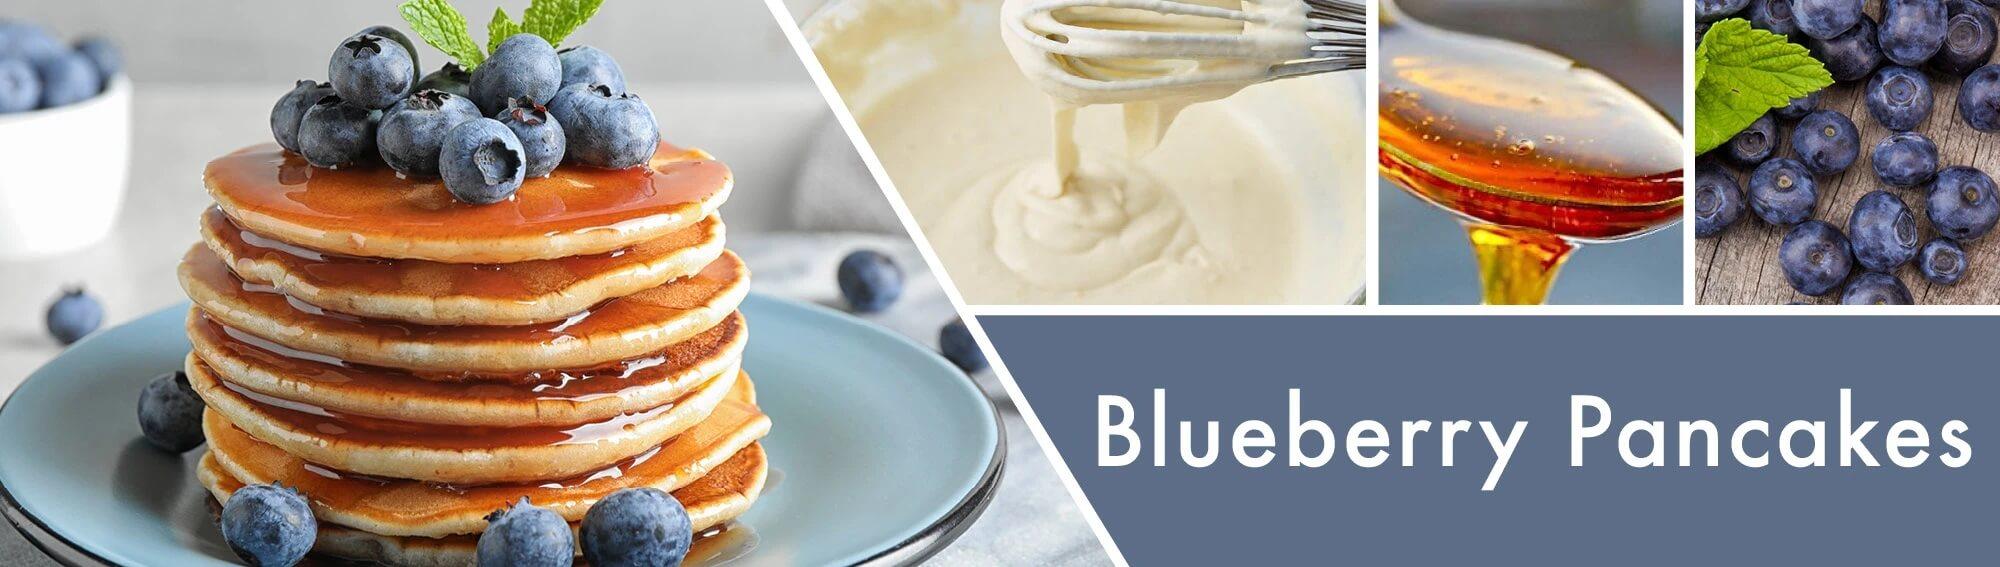 Blueberry-Pancakes-BannerziSfnC5Z8CHZ0